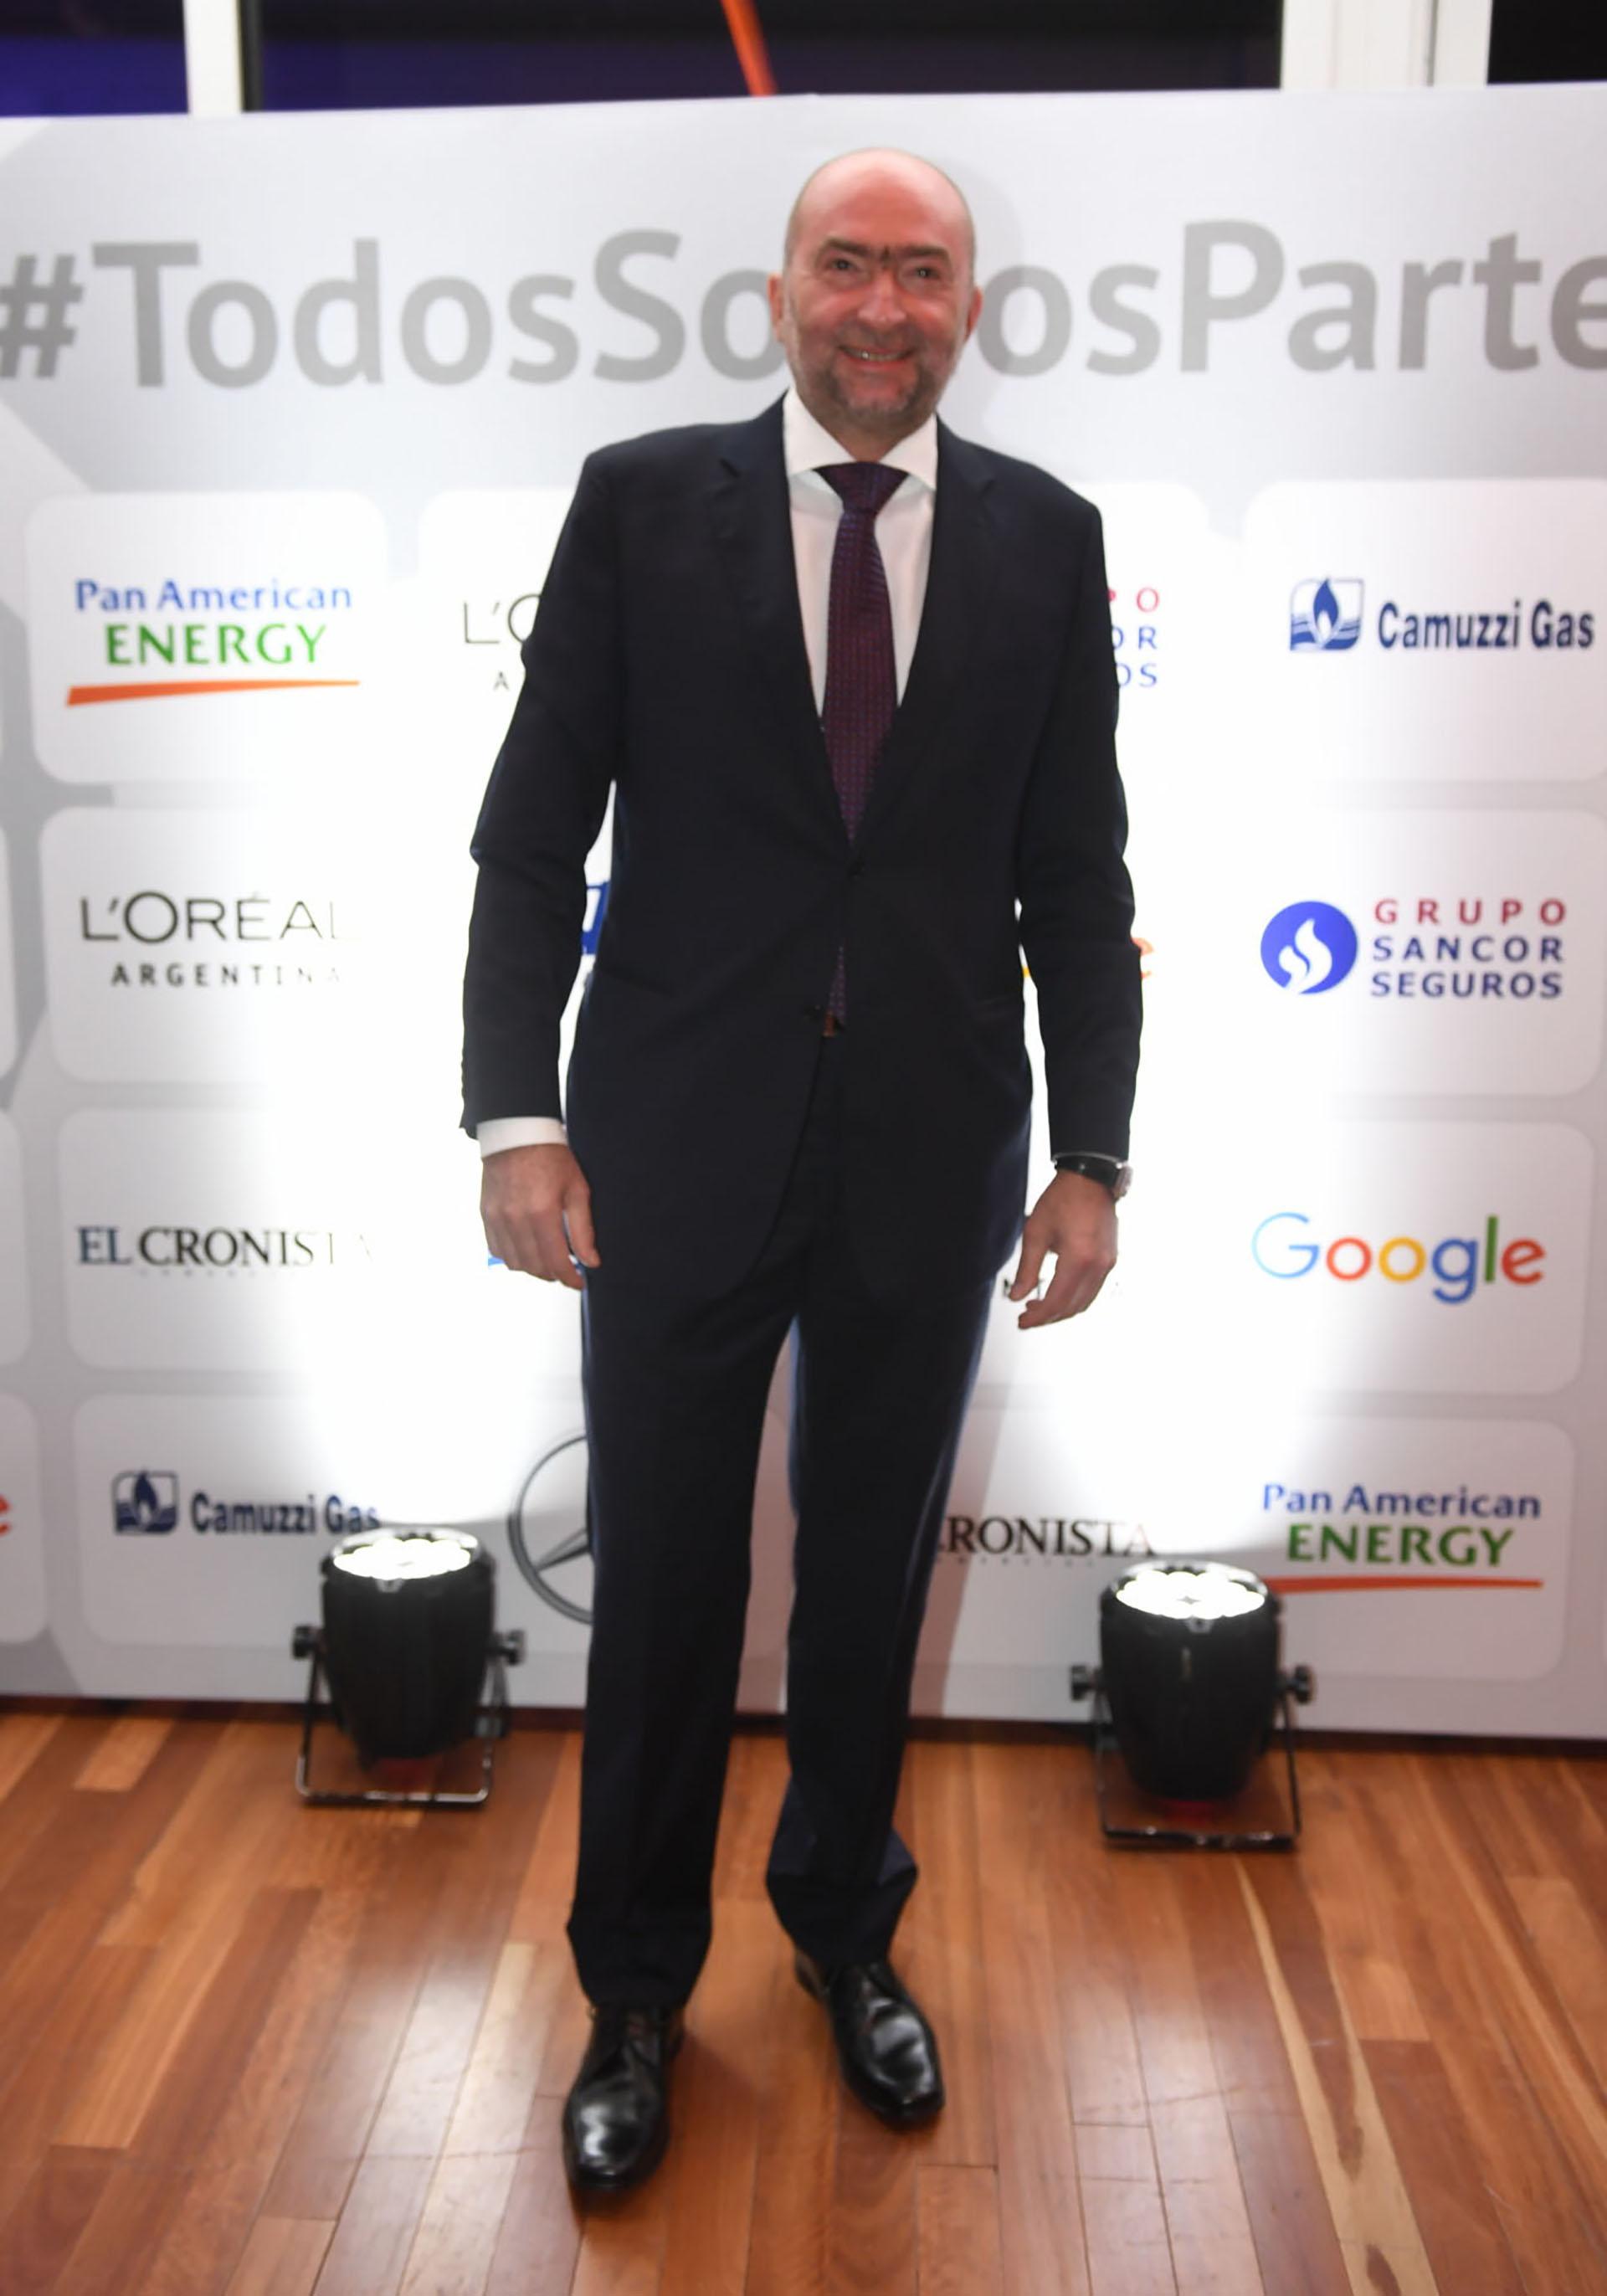 Gustavo Cinosi